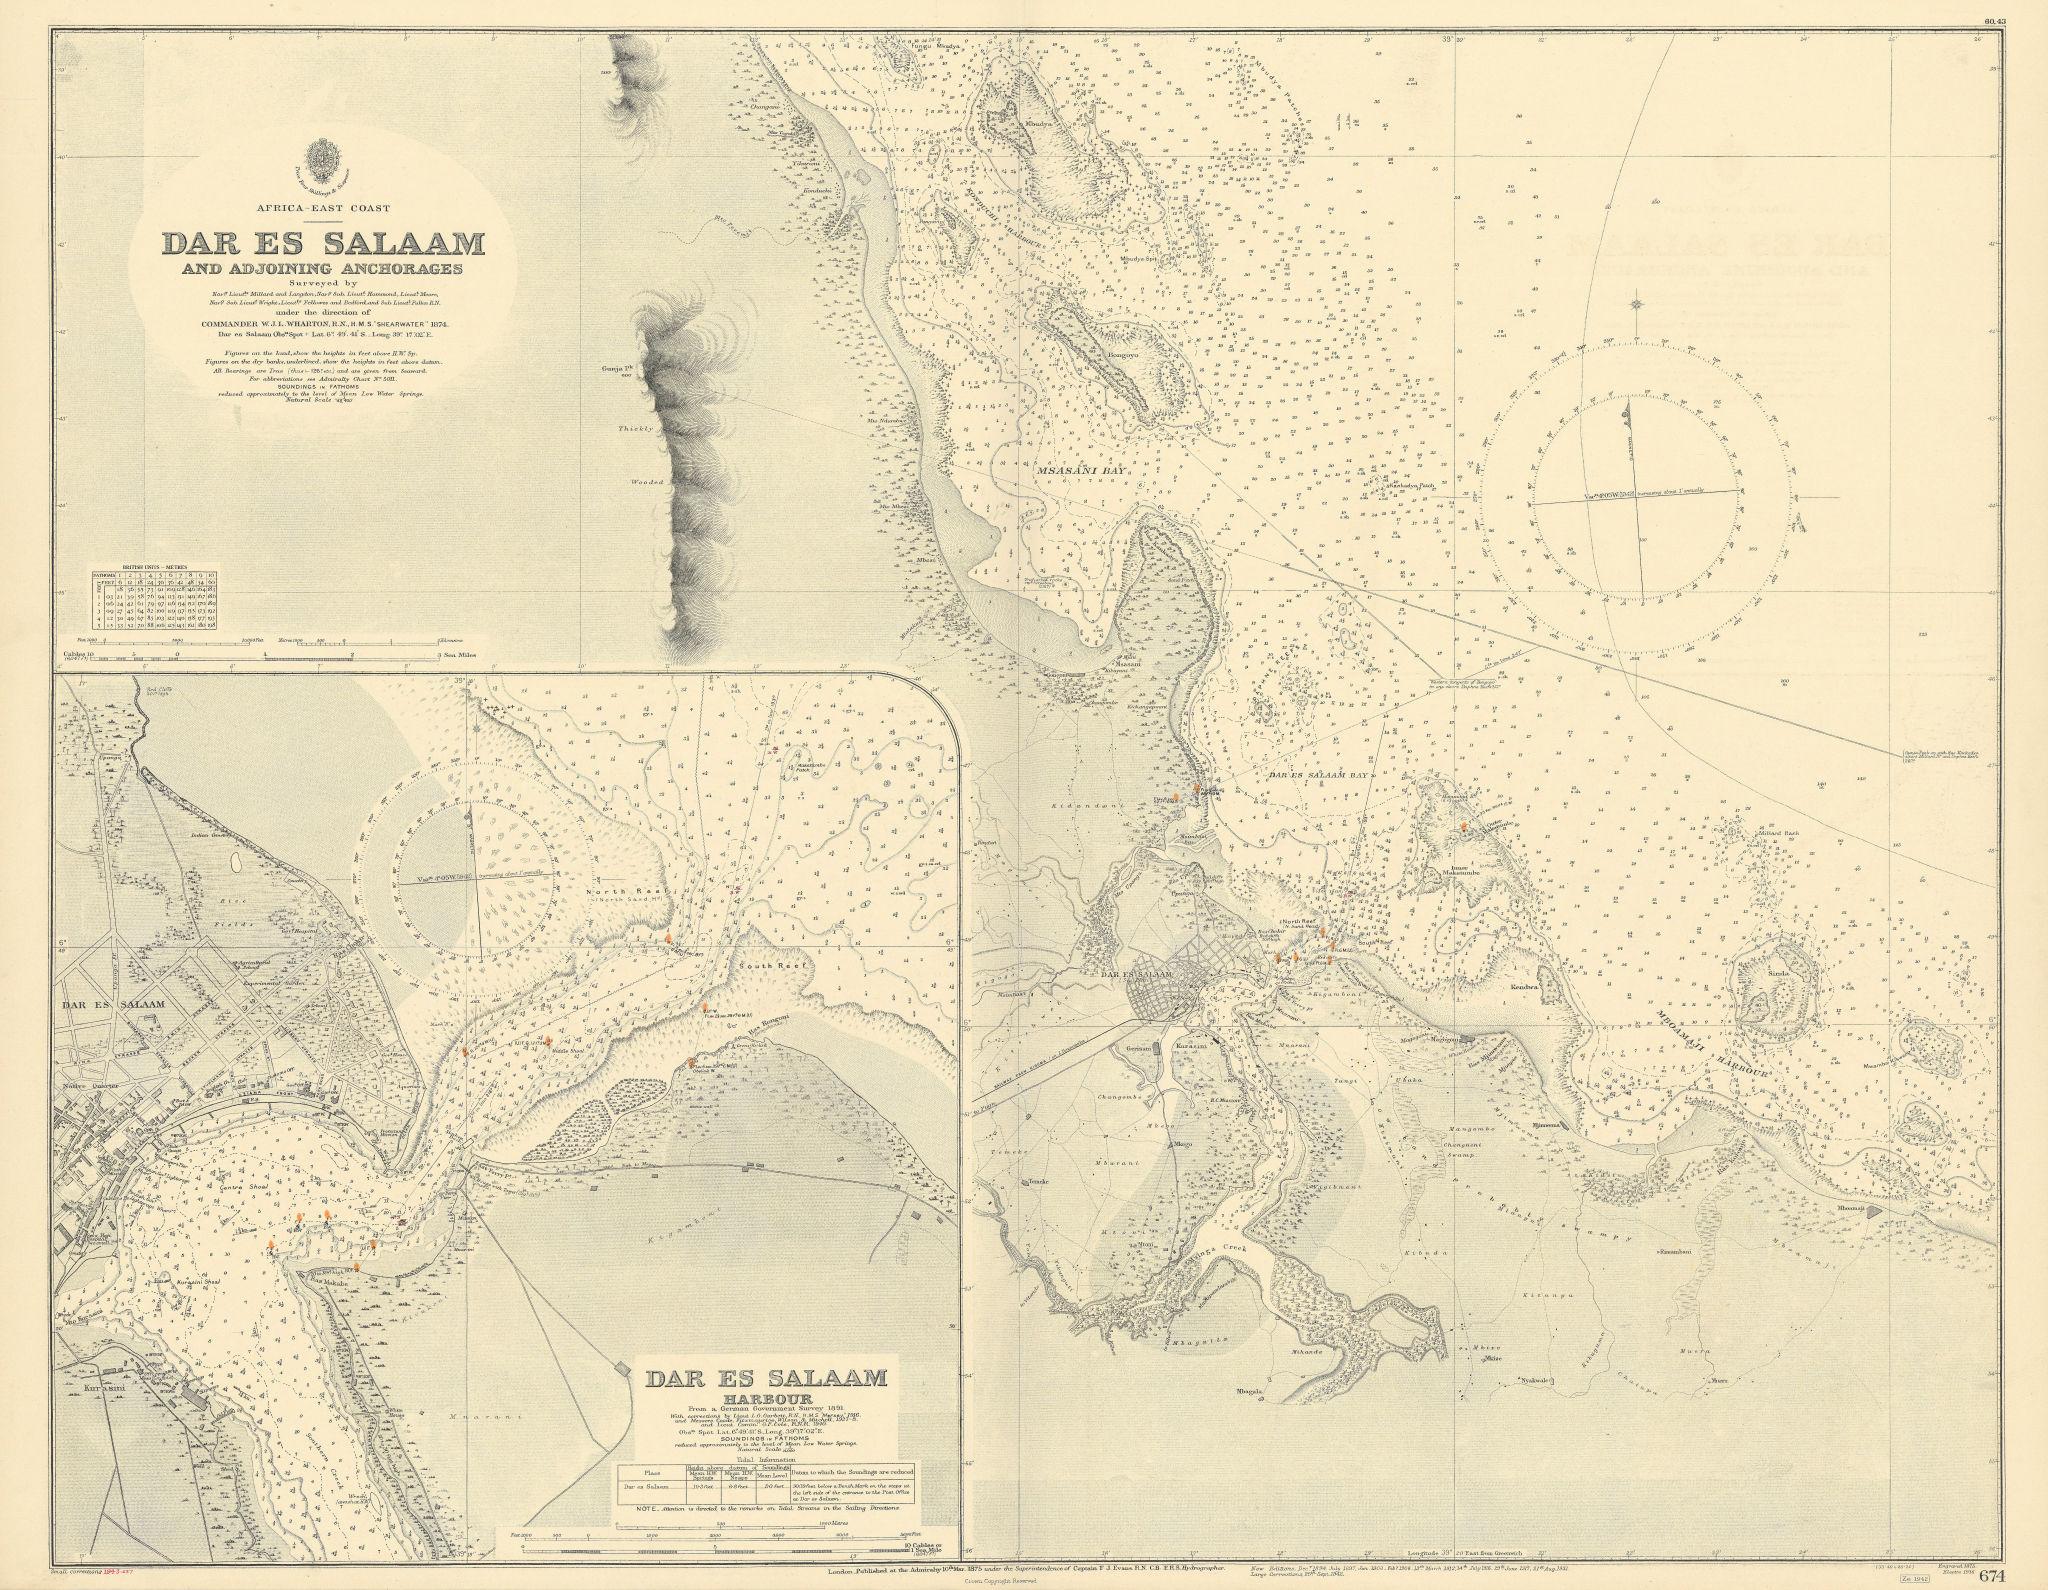 Dar es Salaam harbour/anchorages. Tanzania. ADMIRALTY sea chart 1875 (1943) map